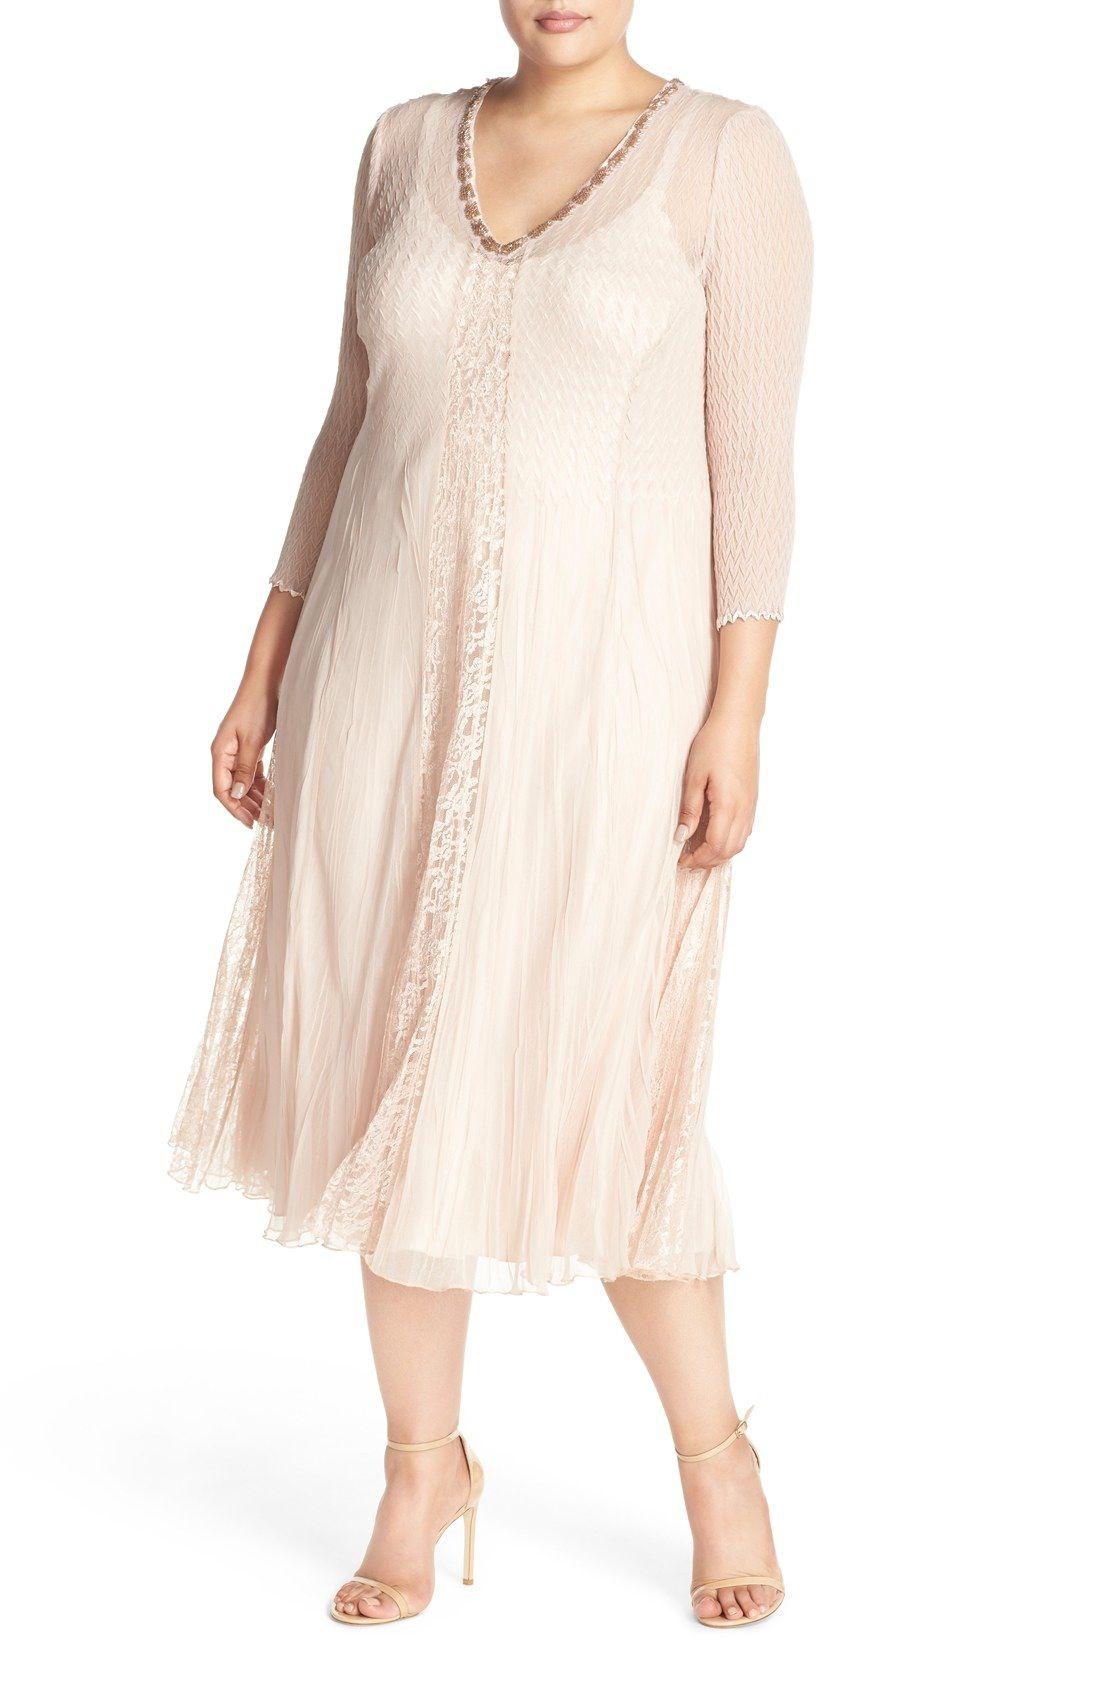 bba53635a07 Komarov Plus Size Dresses Nordstrom - Gomes Weine AG